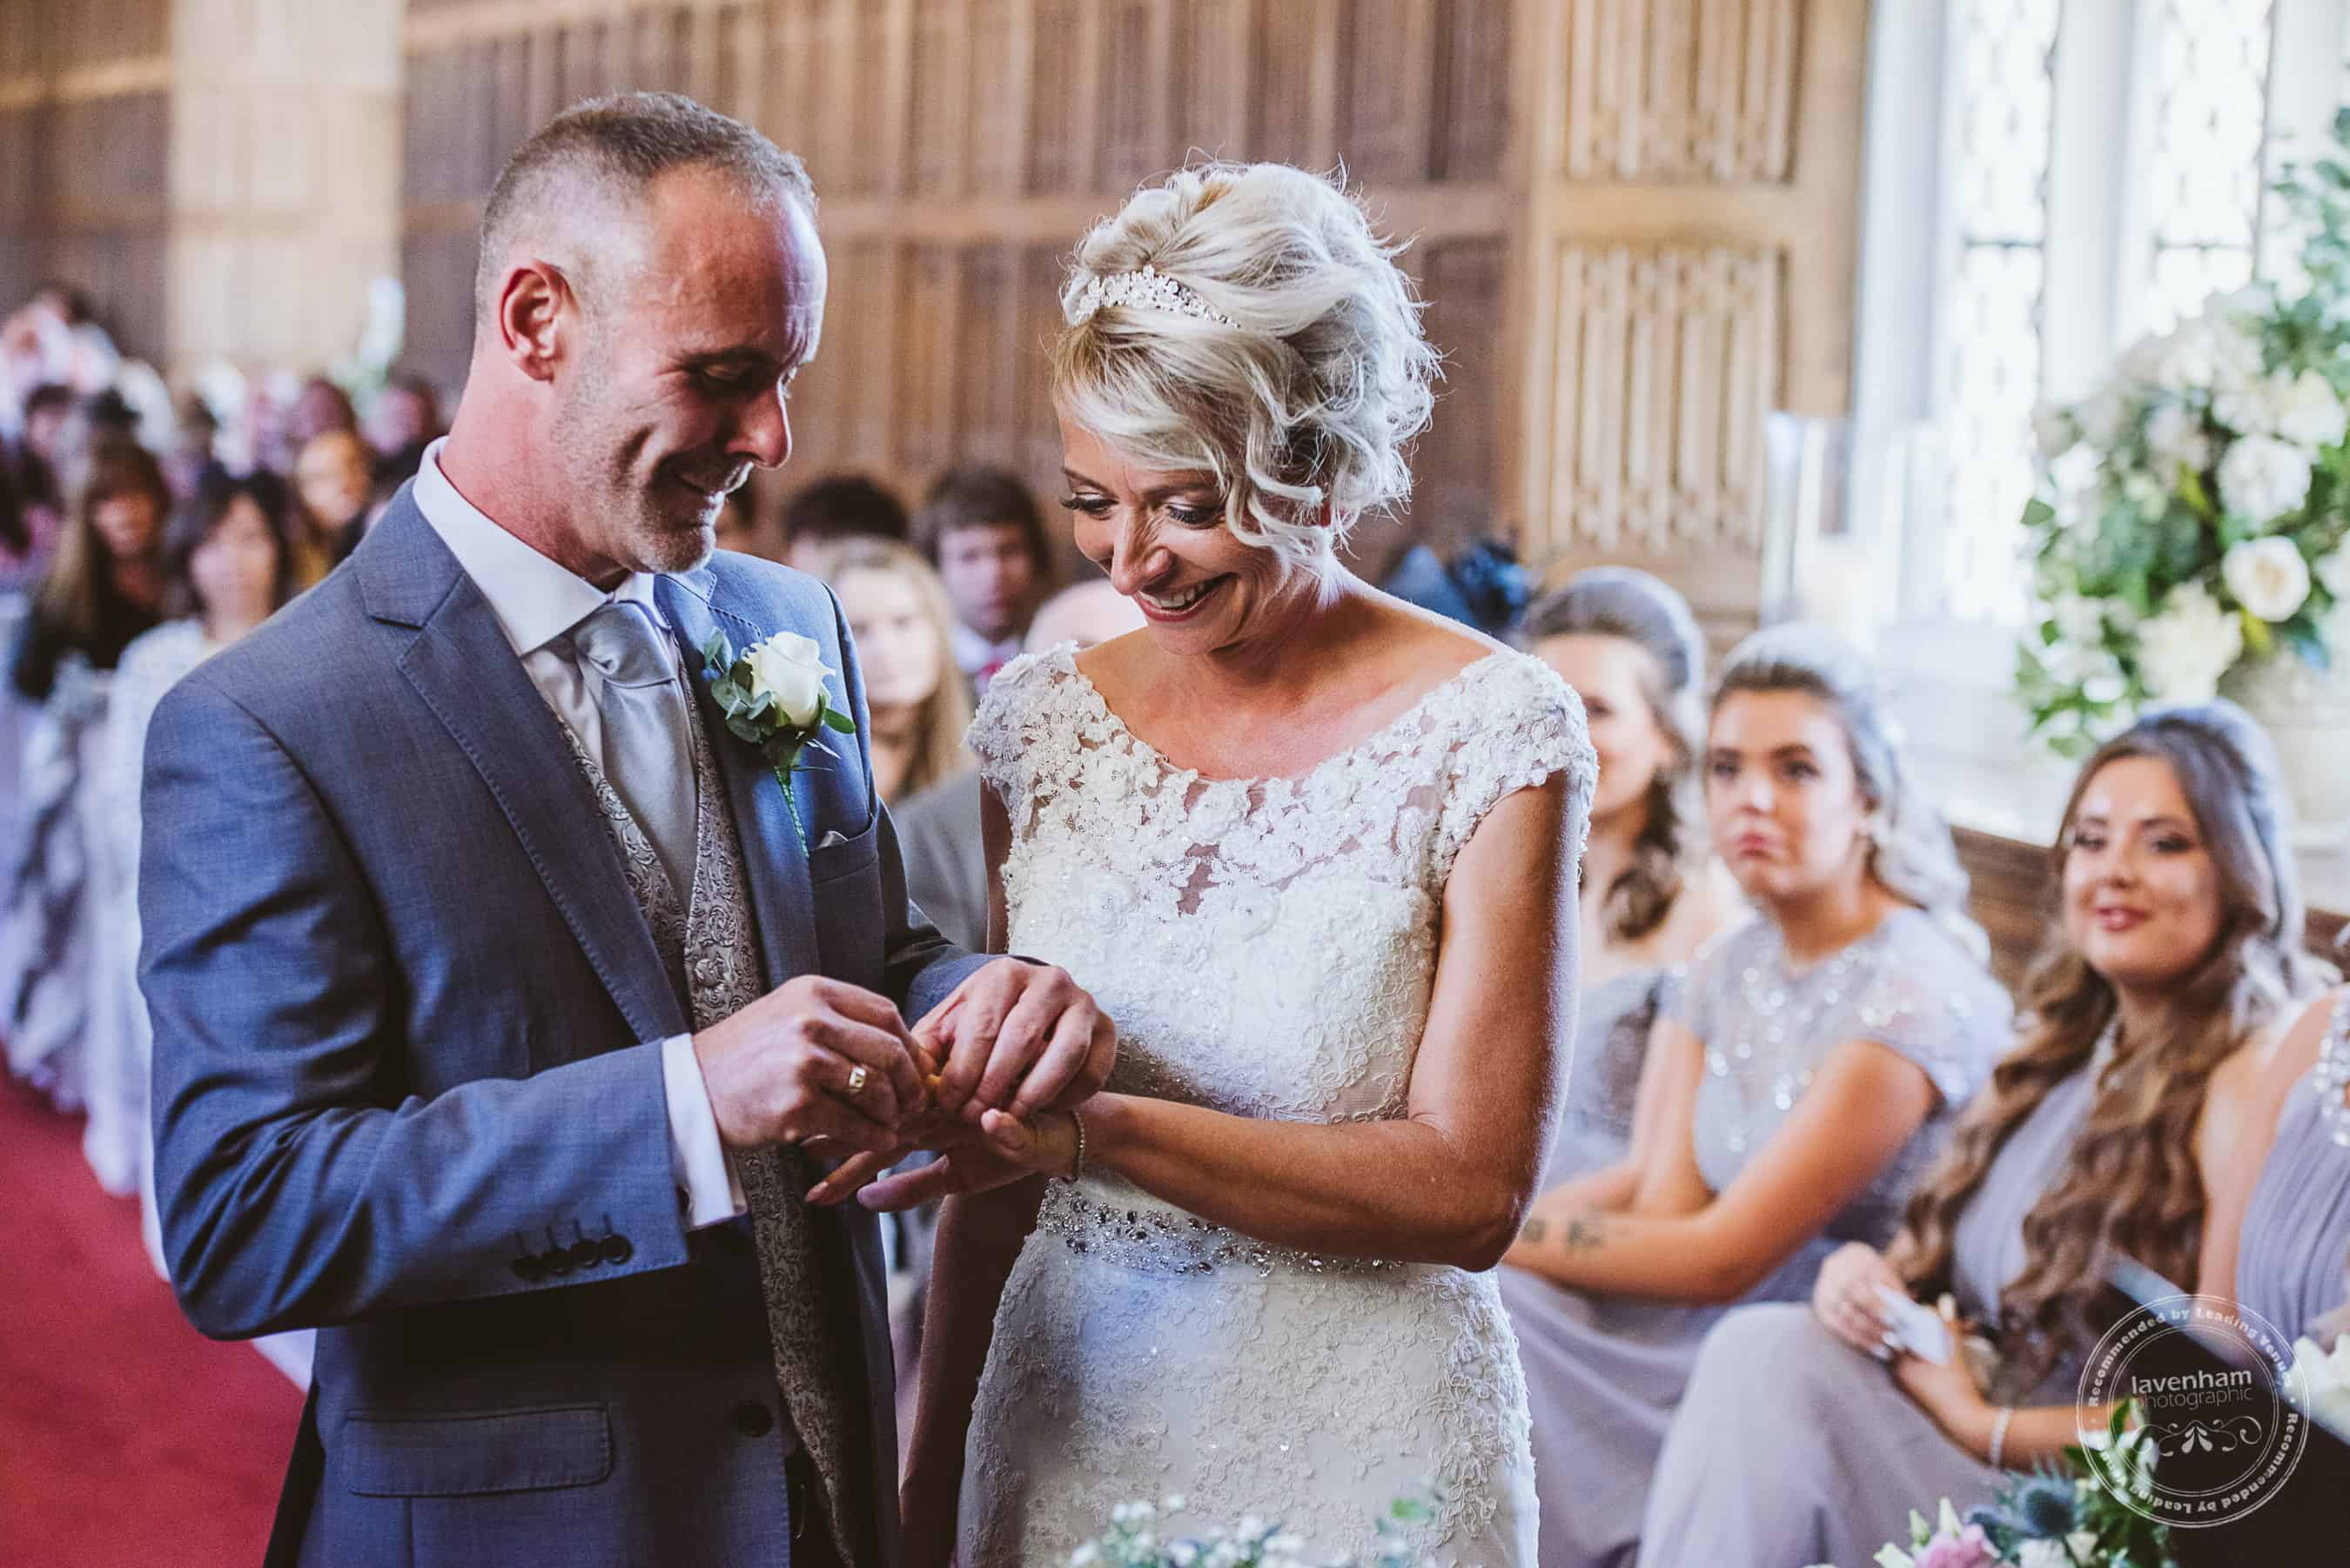 281018 Gosfield Hall Wedding Photography Lavenham Photographic 051